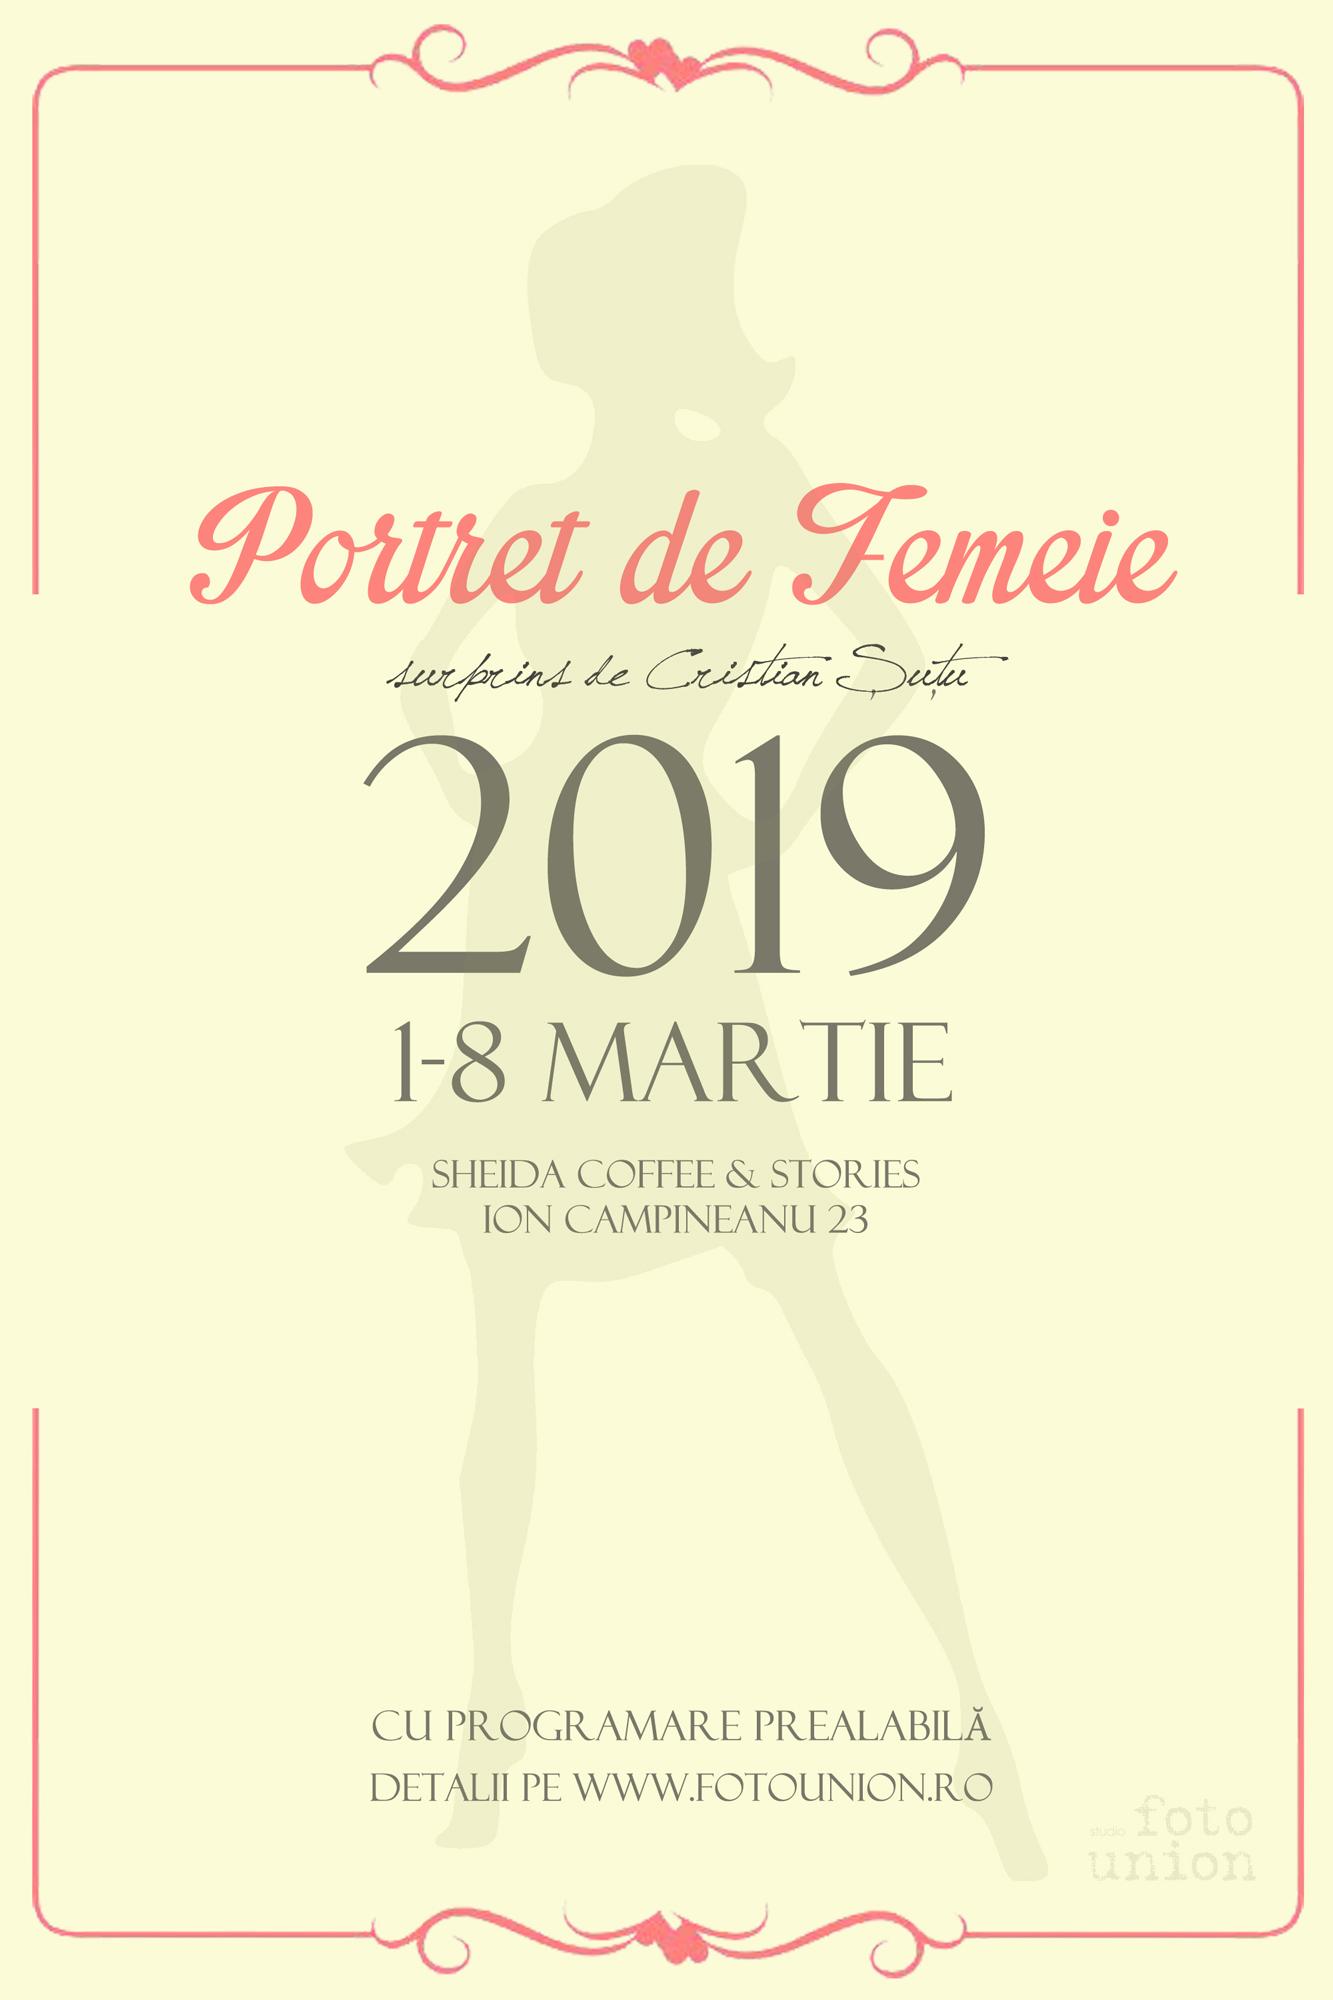 portret-de-femeie-2019-web